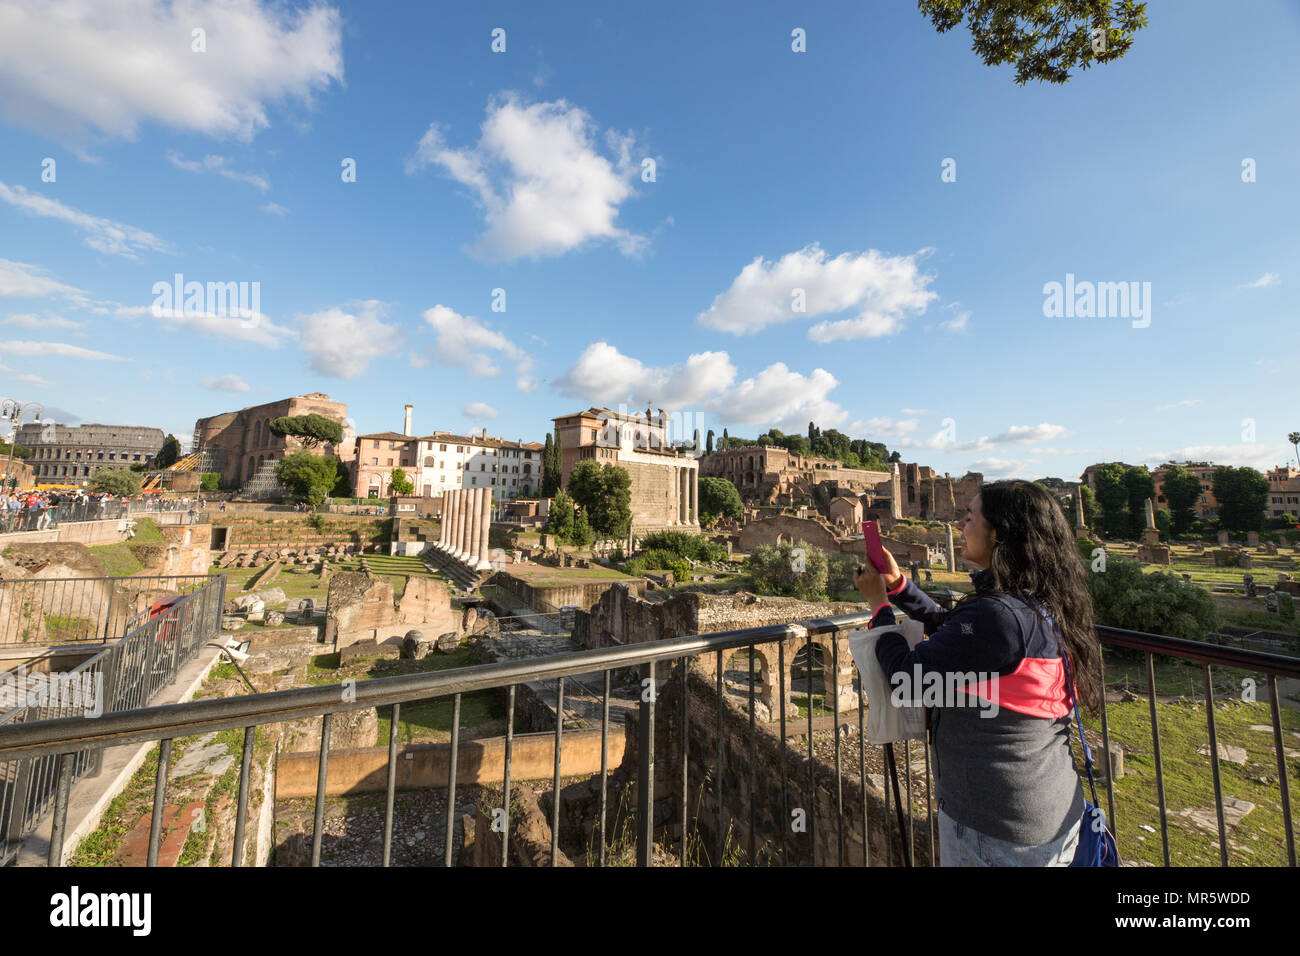 Roman Forum, Foro Romano, archelogic area - Stock Image